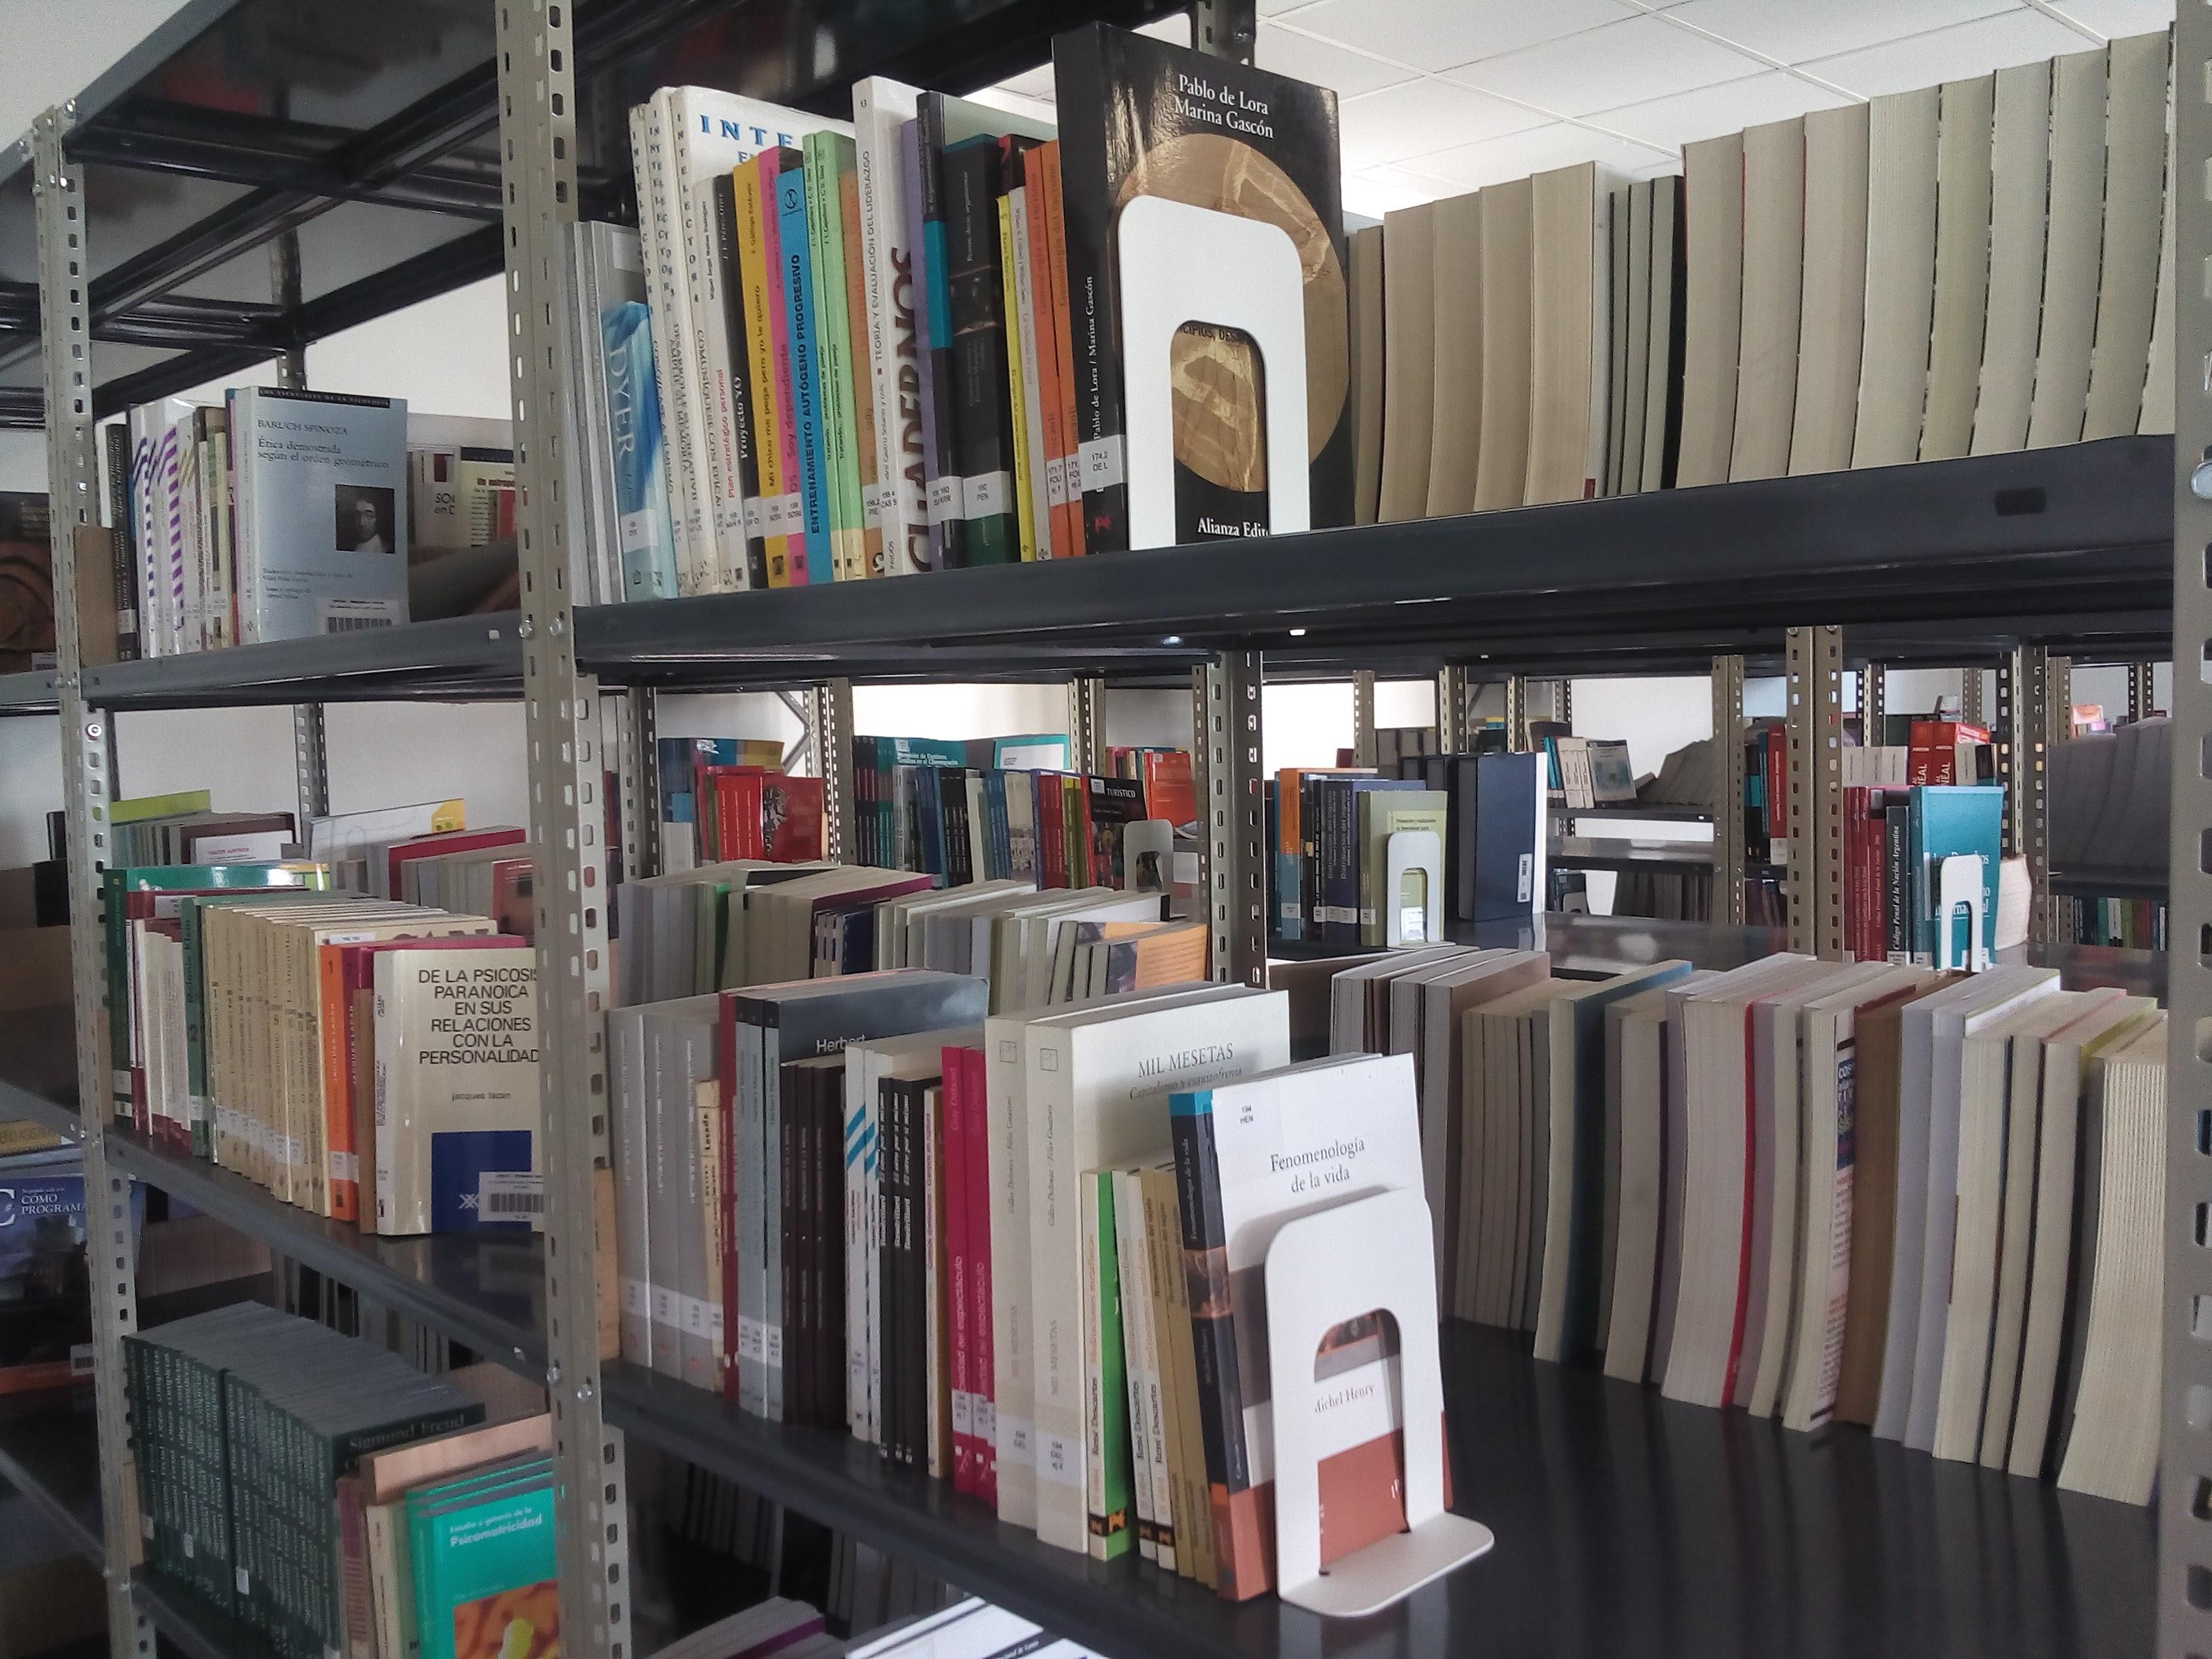 Biblioteca UNDAV 2 - Biblioteca Central UNDAV